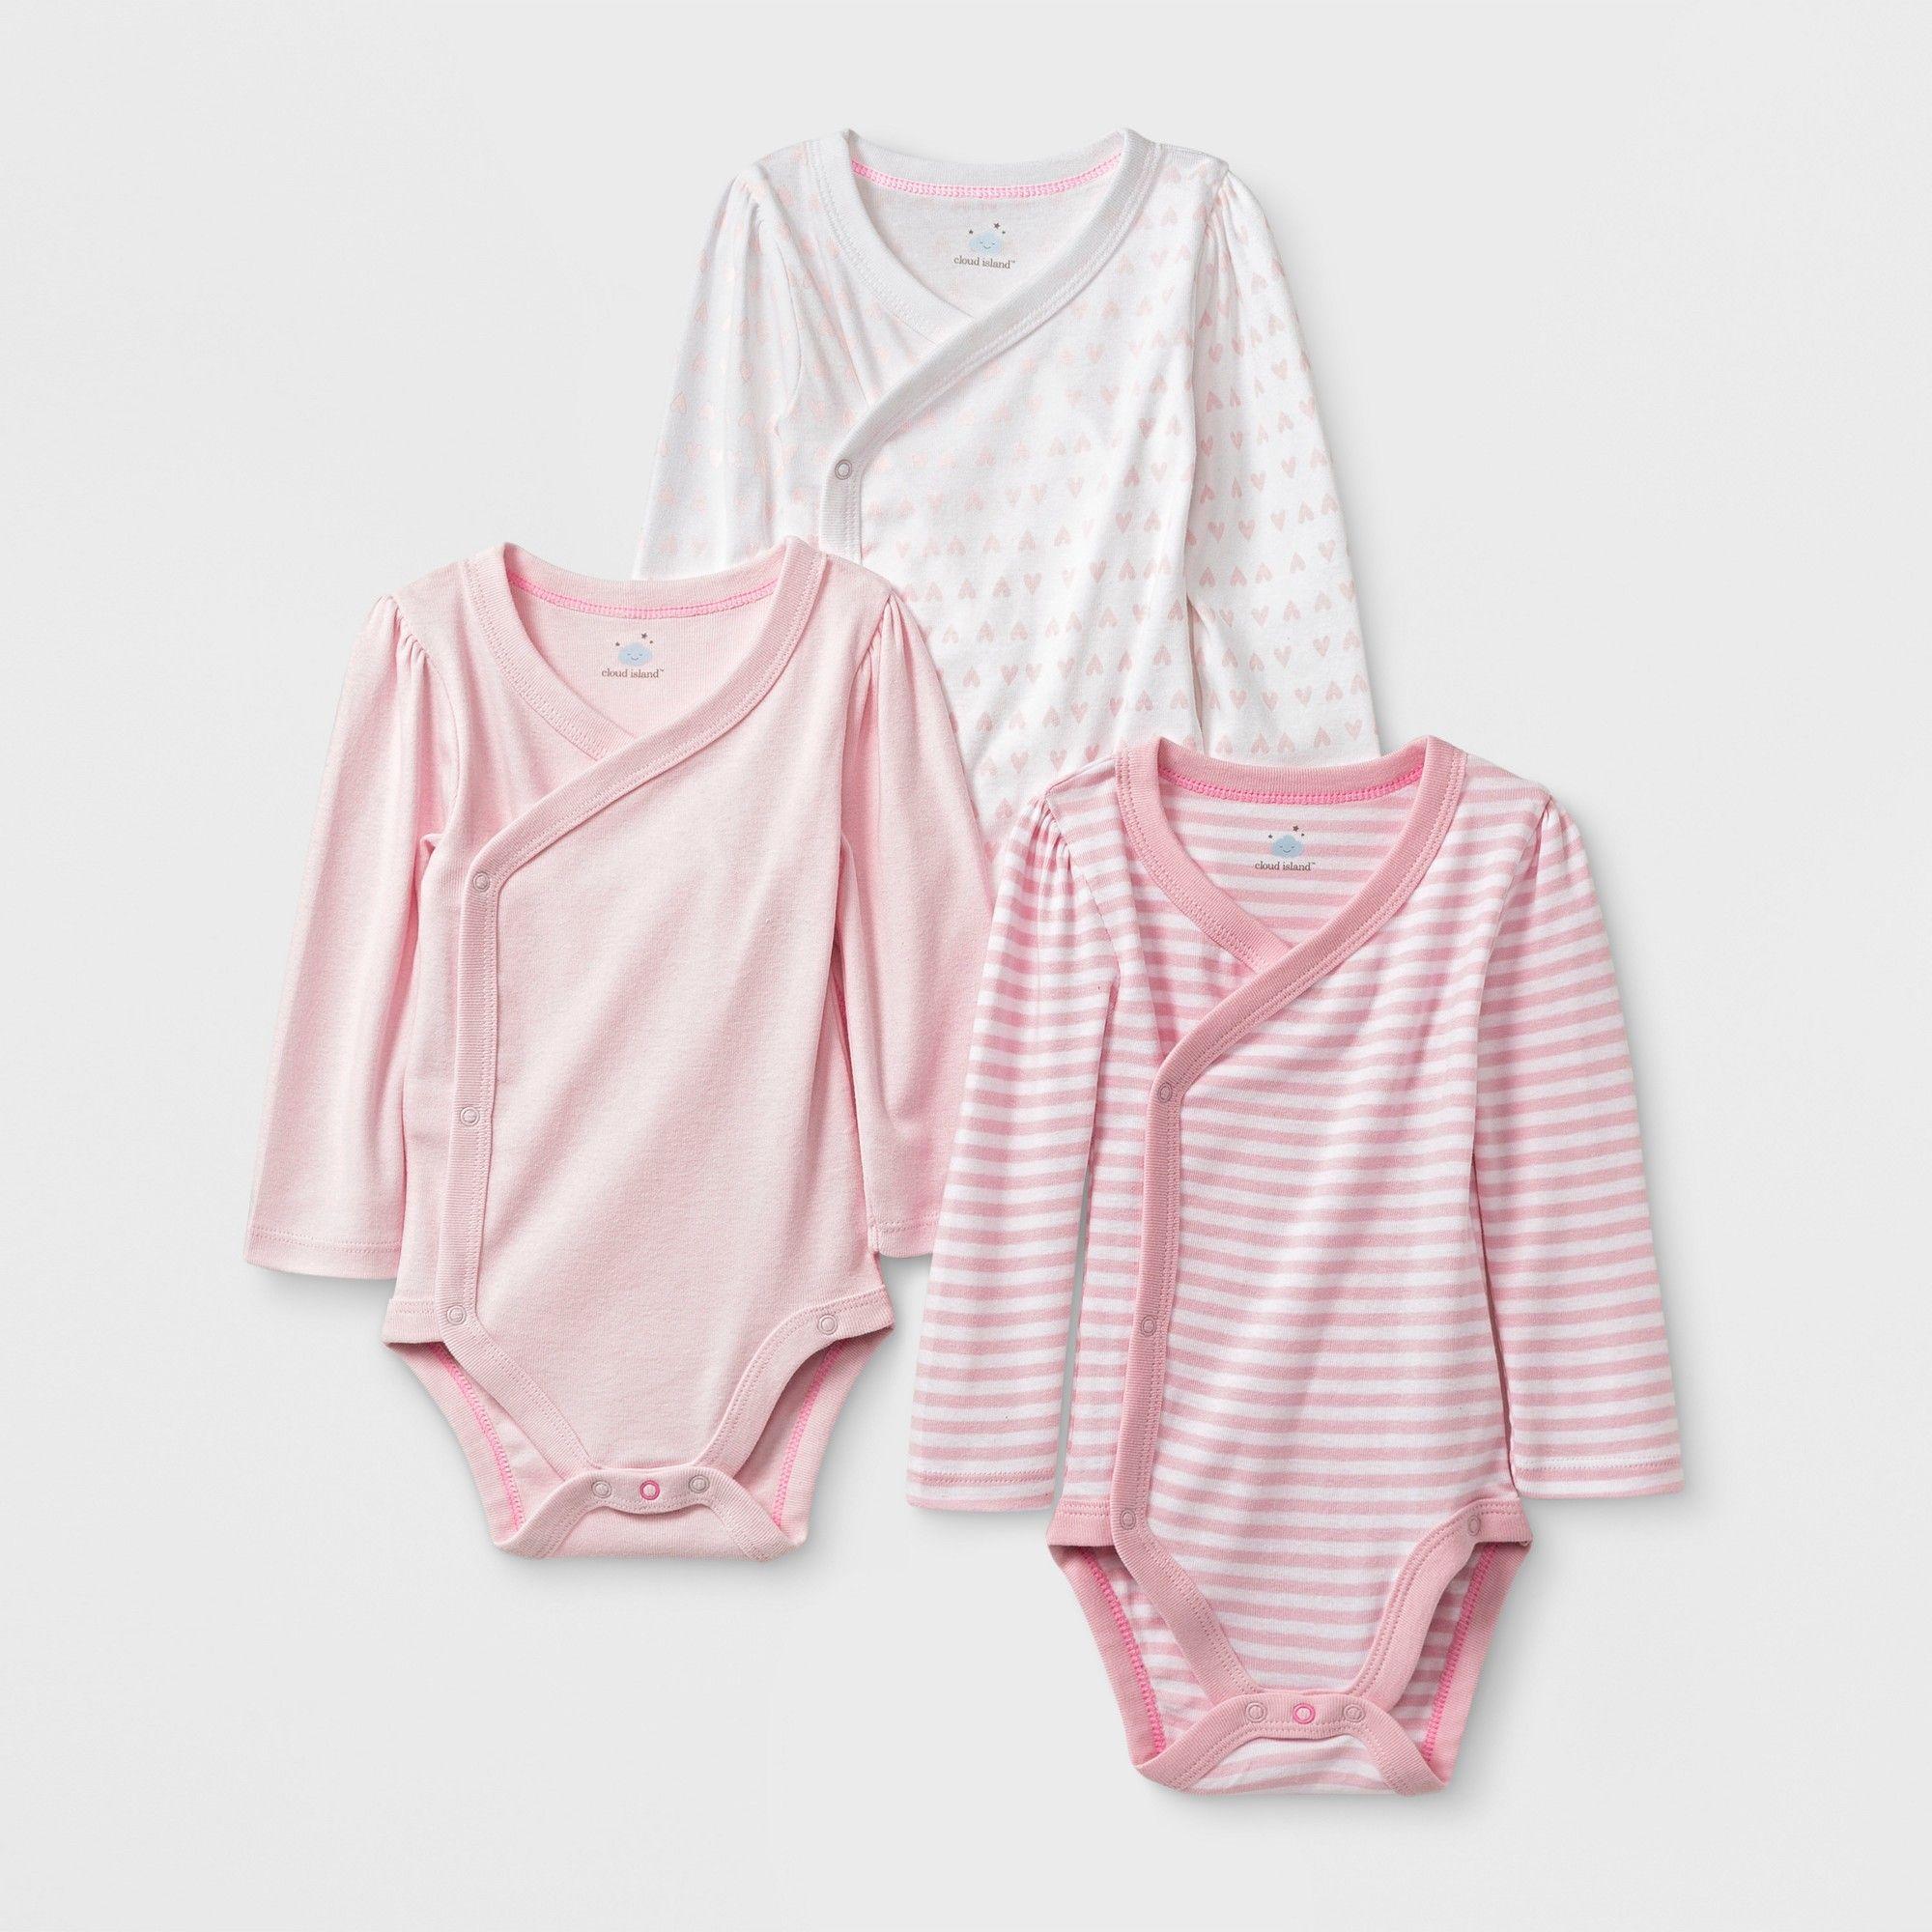 e0ec5b292 Baby Girls' 3pk Side Snap Bodysuits - Cloud Island Newborn, Multicolored